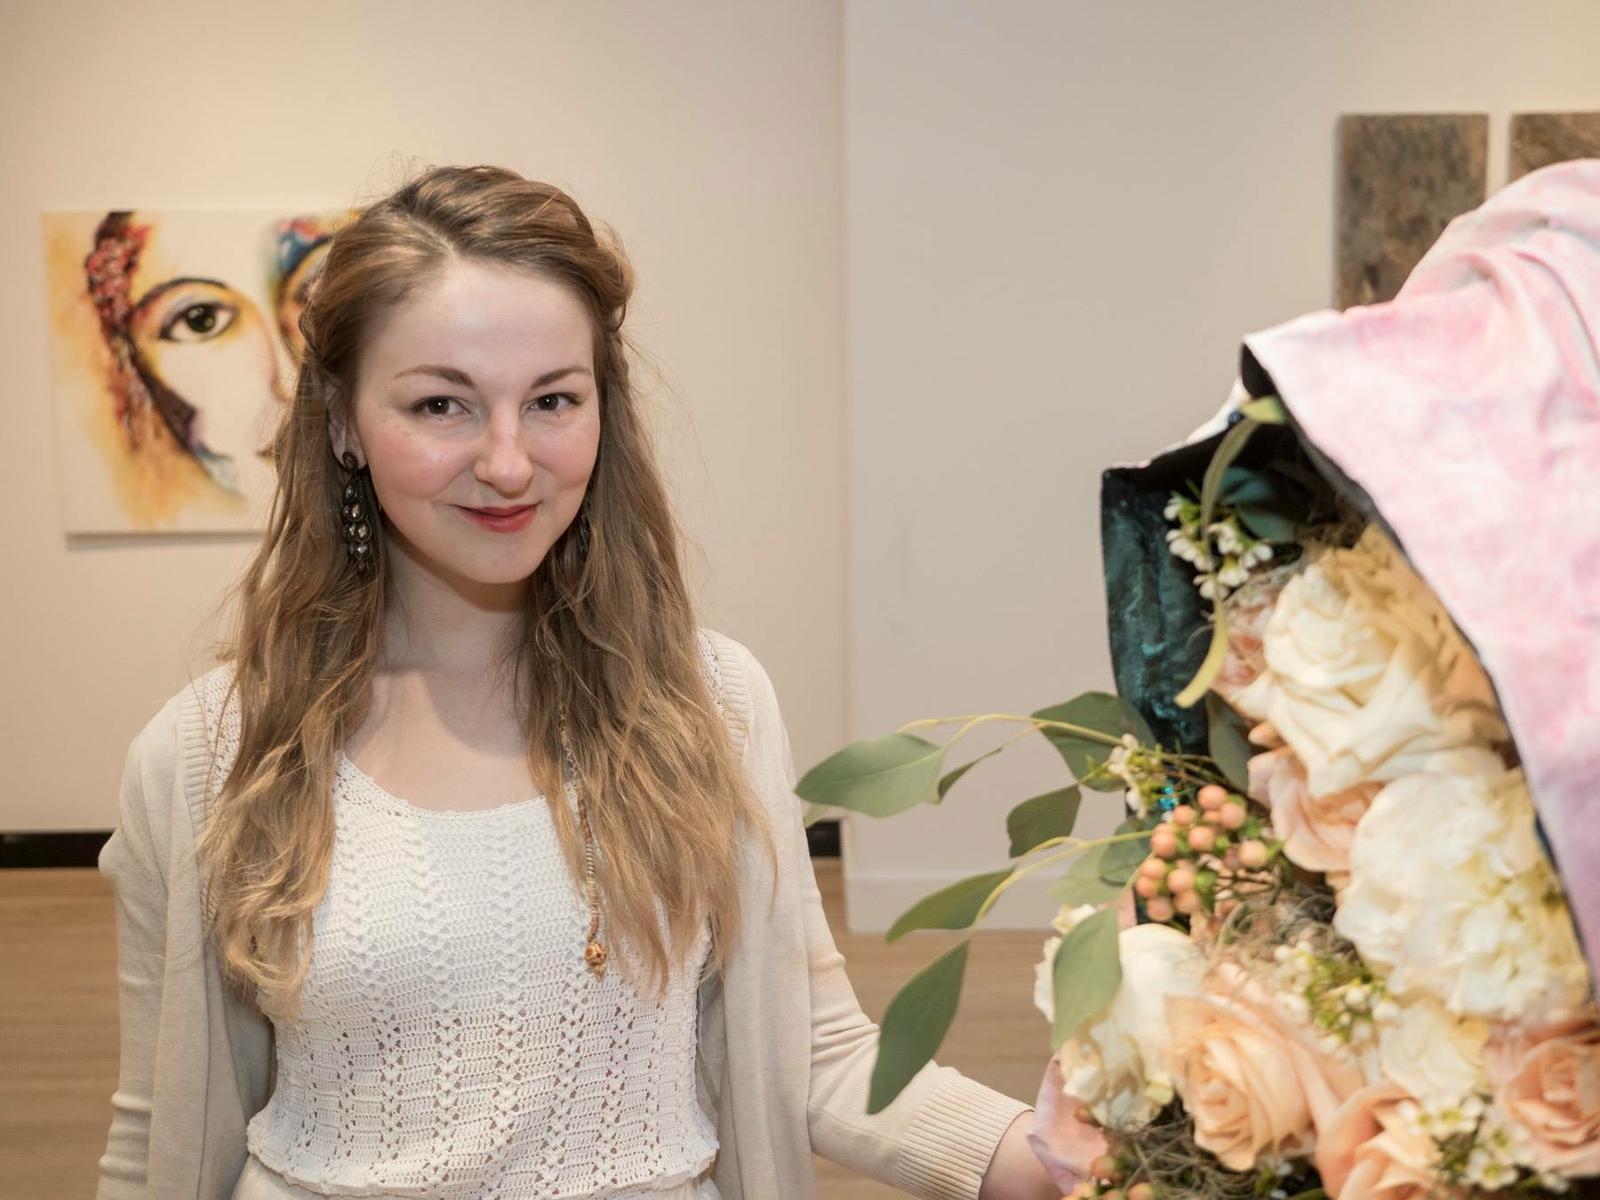 Rose Durocher